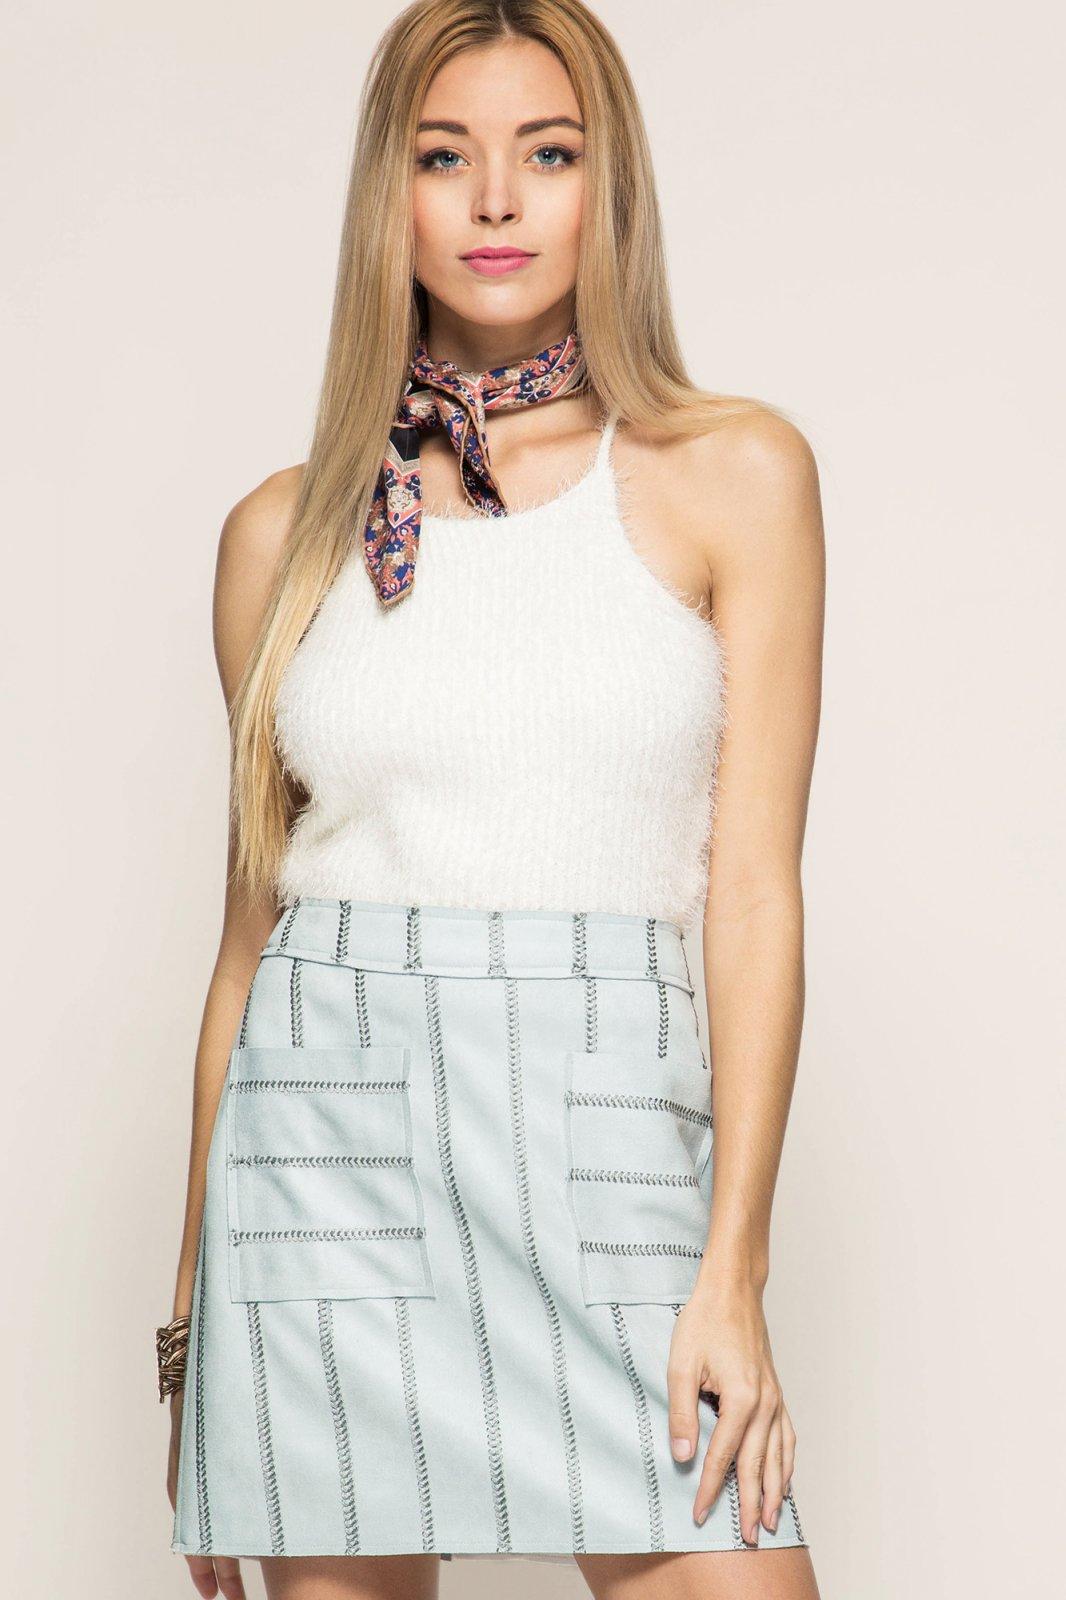 FAUX LEATHER Mini Skirt BLUE GREY * JR / Ms / Adult PT